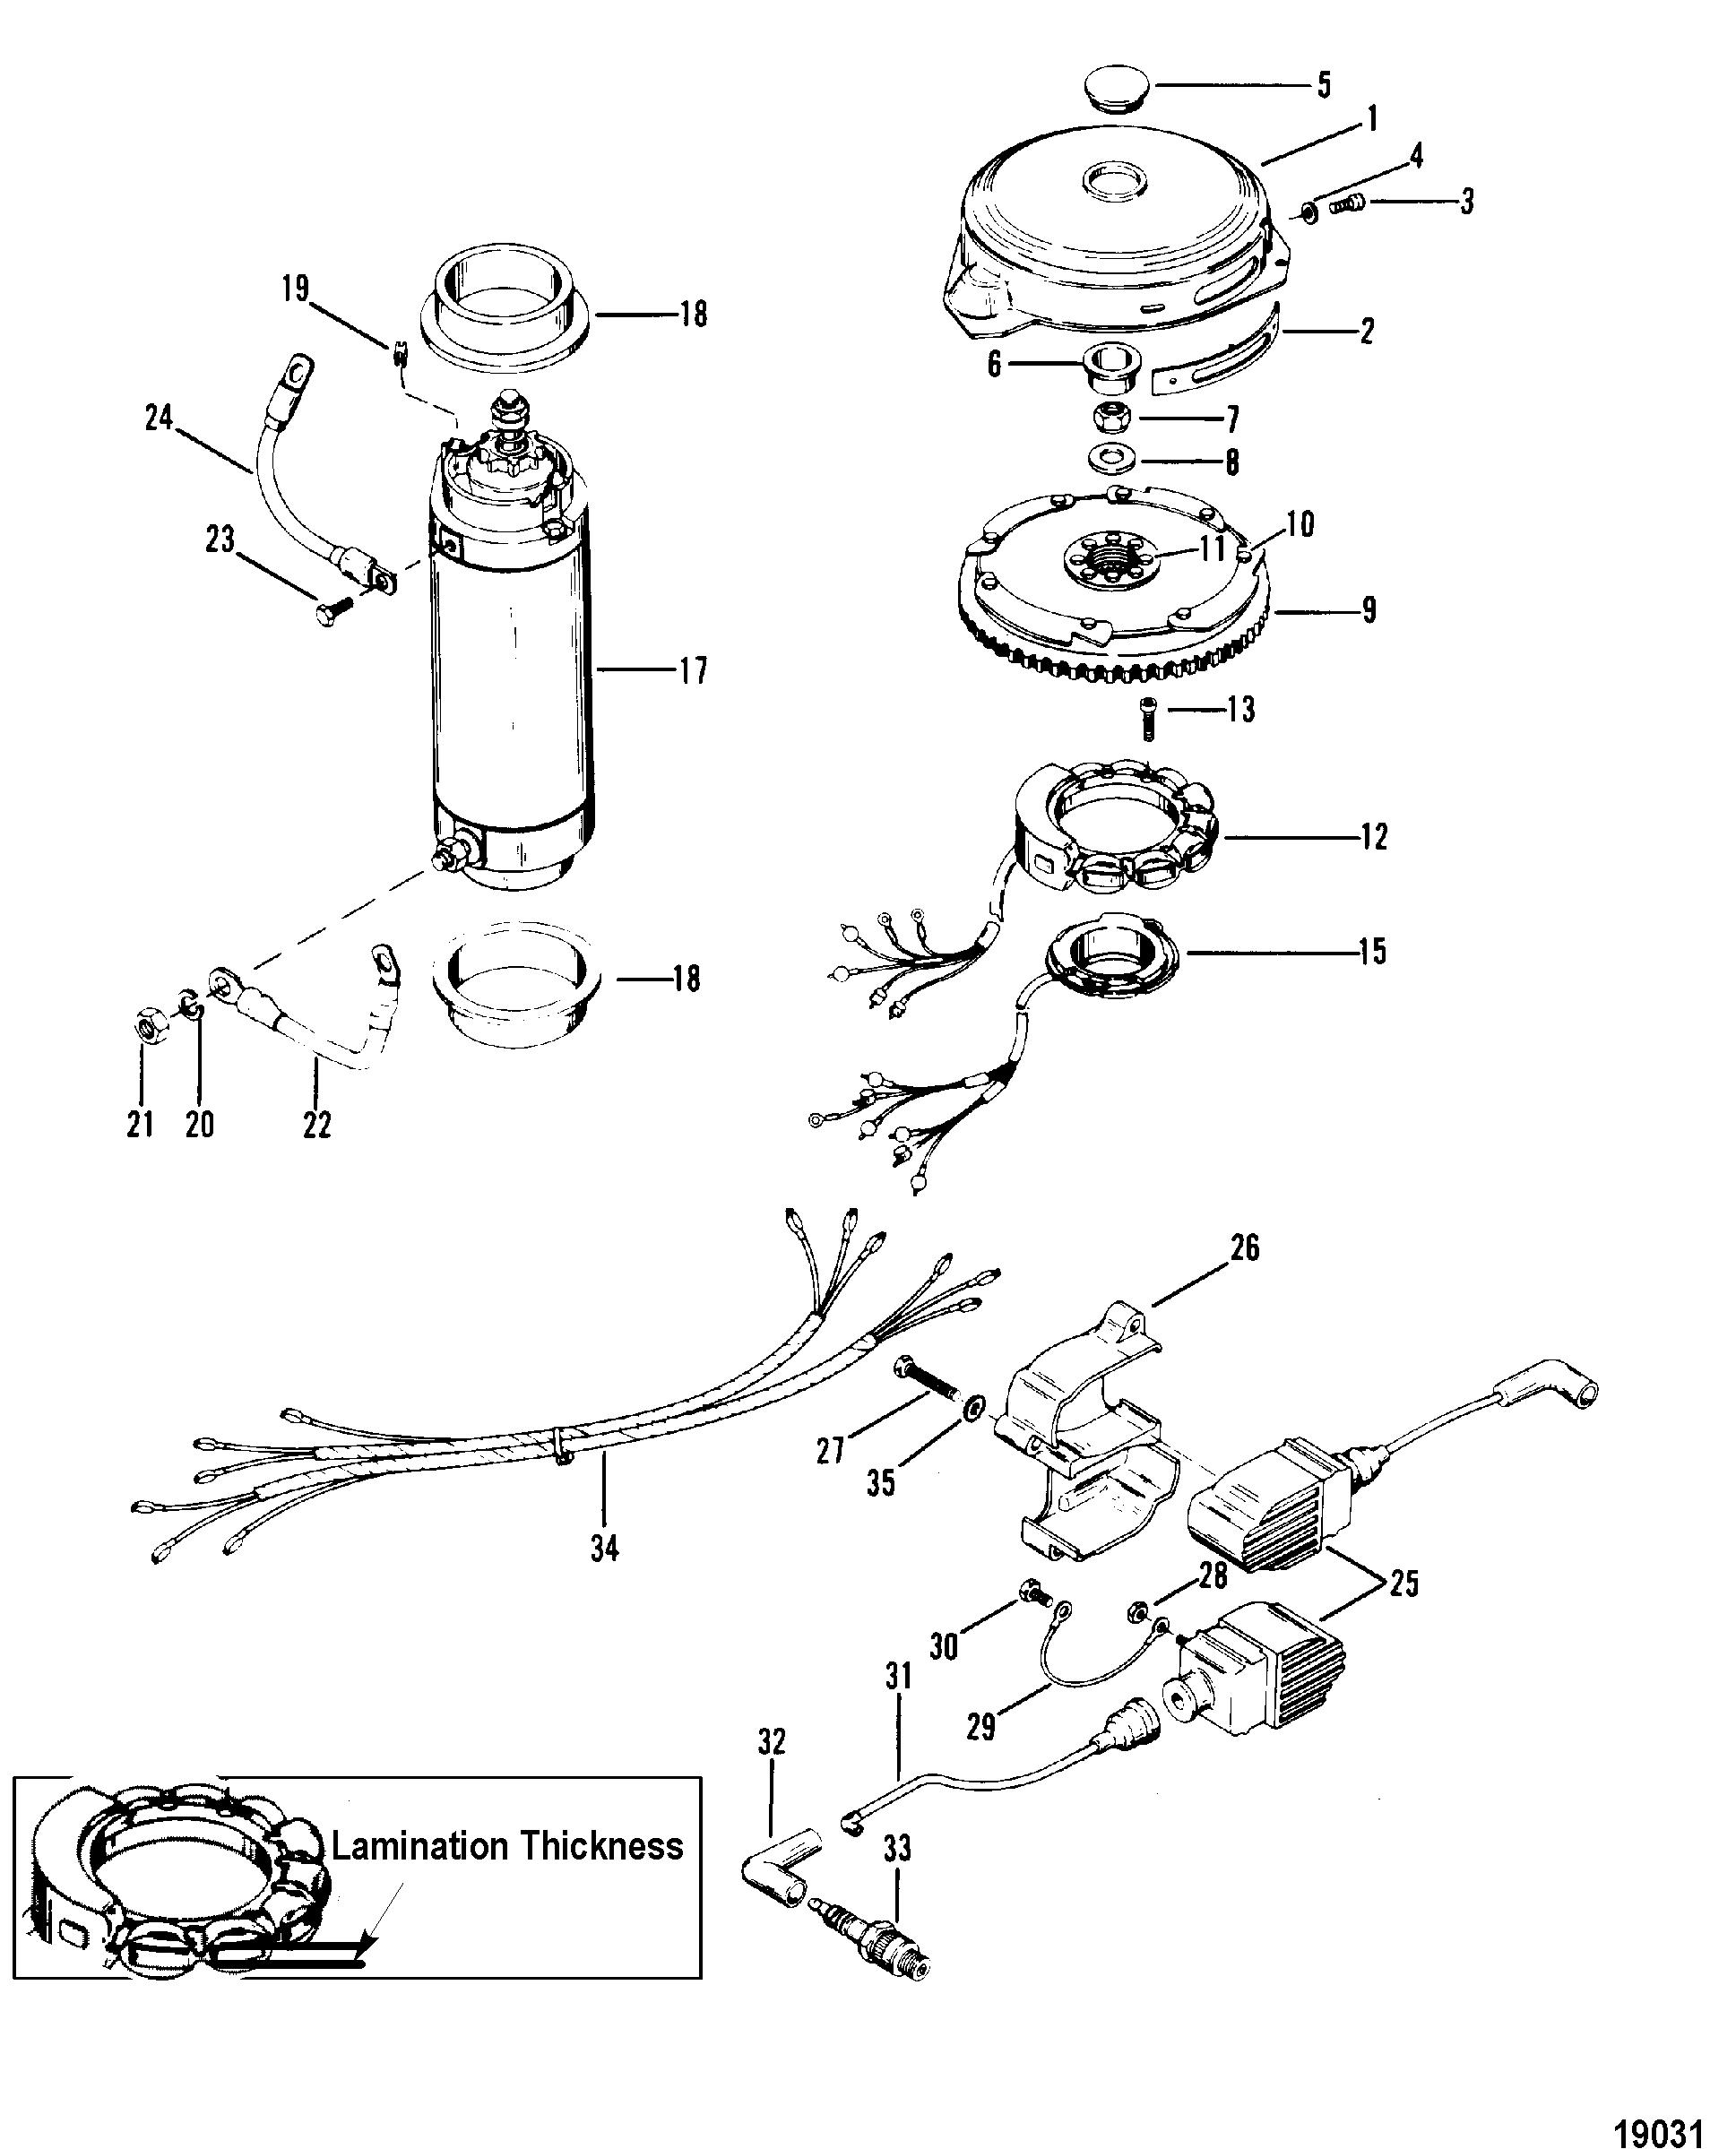 flywheel  starter motor and ignition coils for mariner